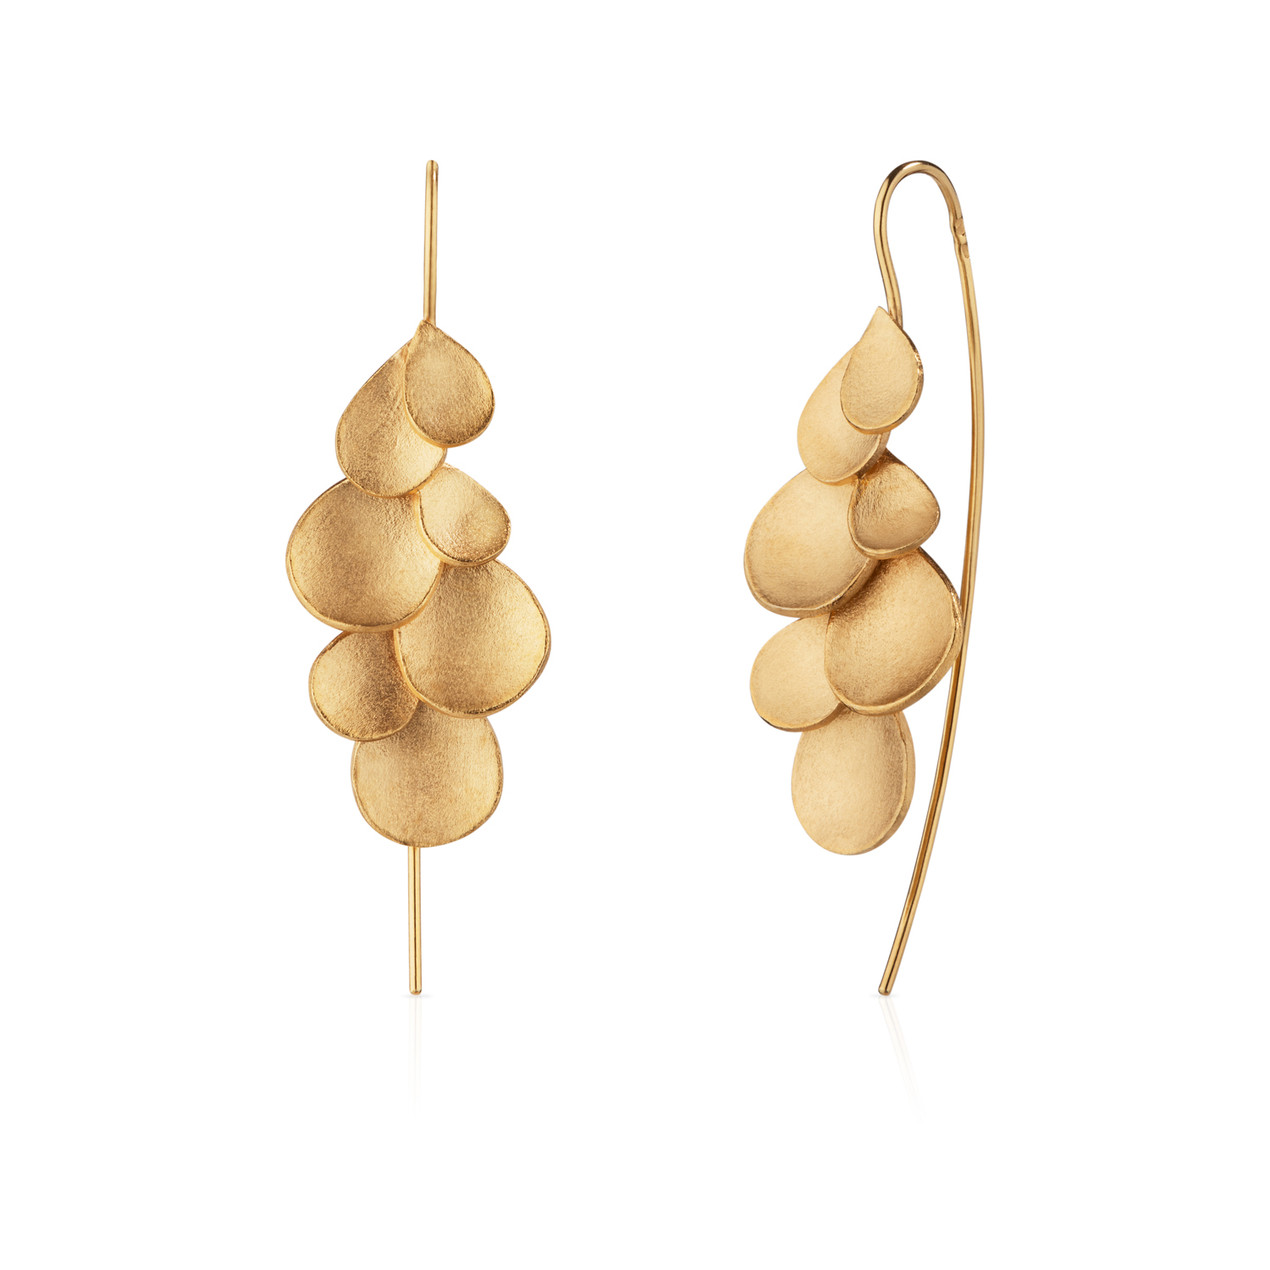 Brincos Prata Colecção Hin Ana Sales MOD Jewellery